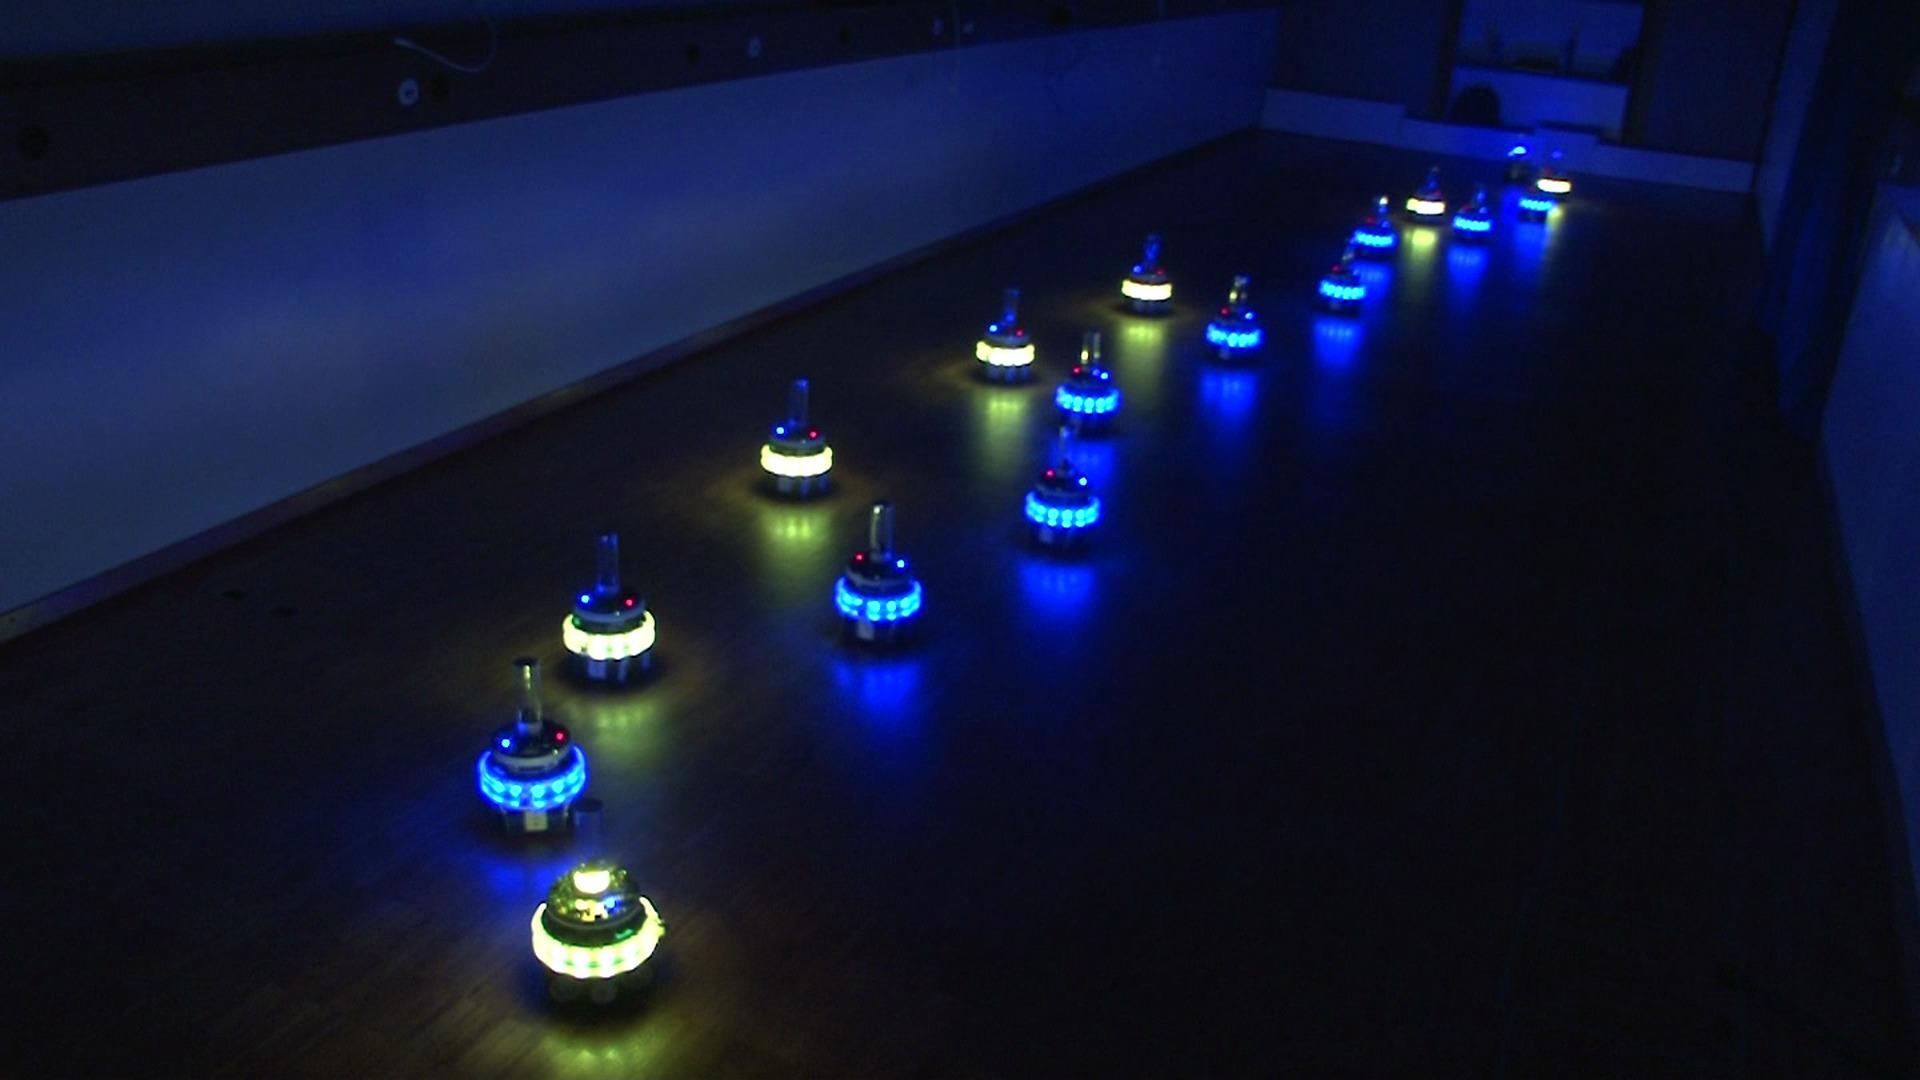 Swarm Robotics Idsia